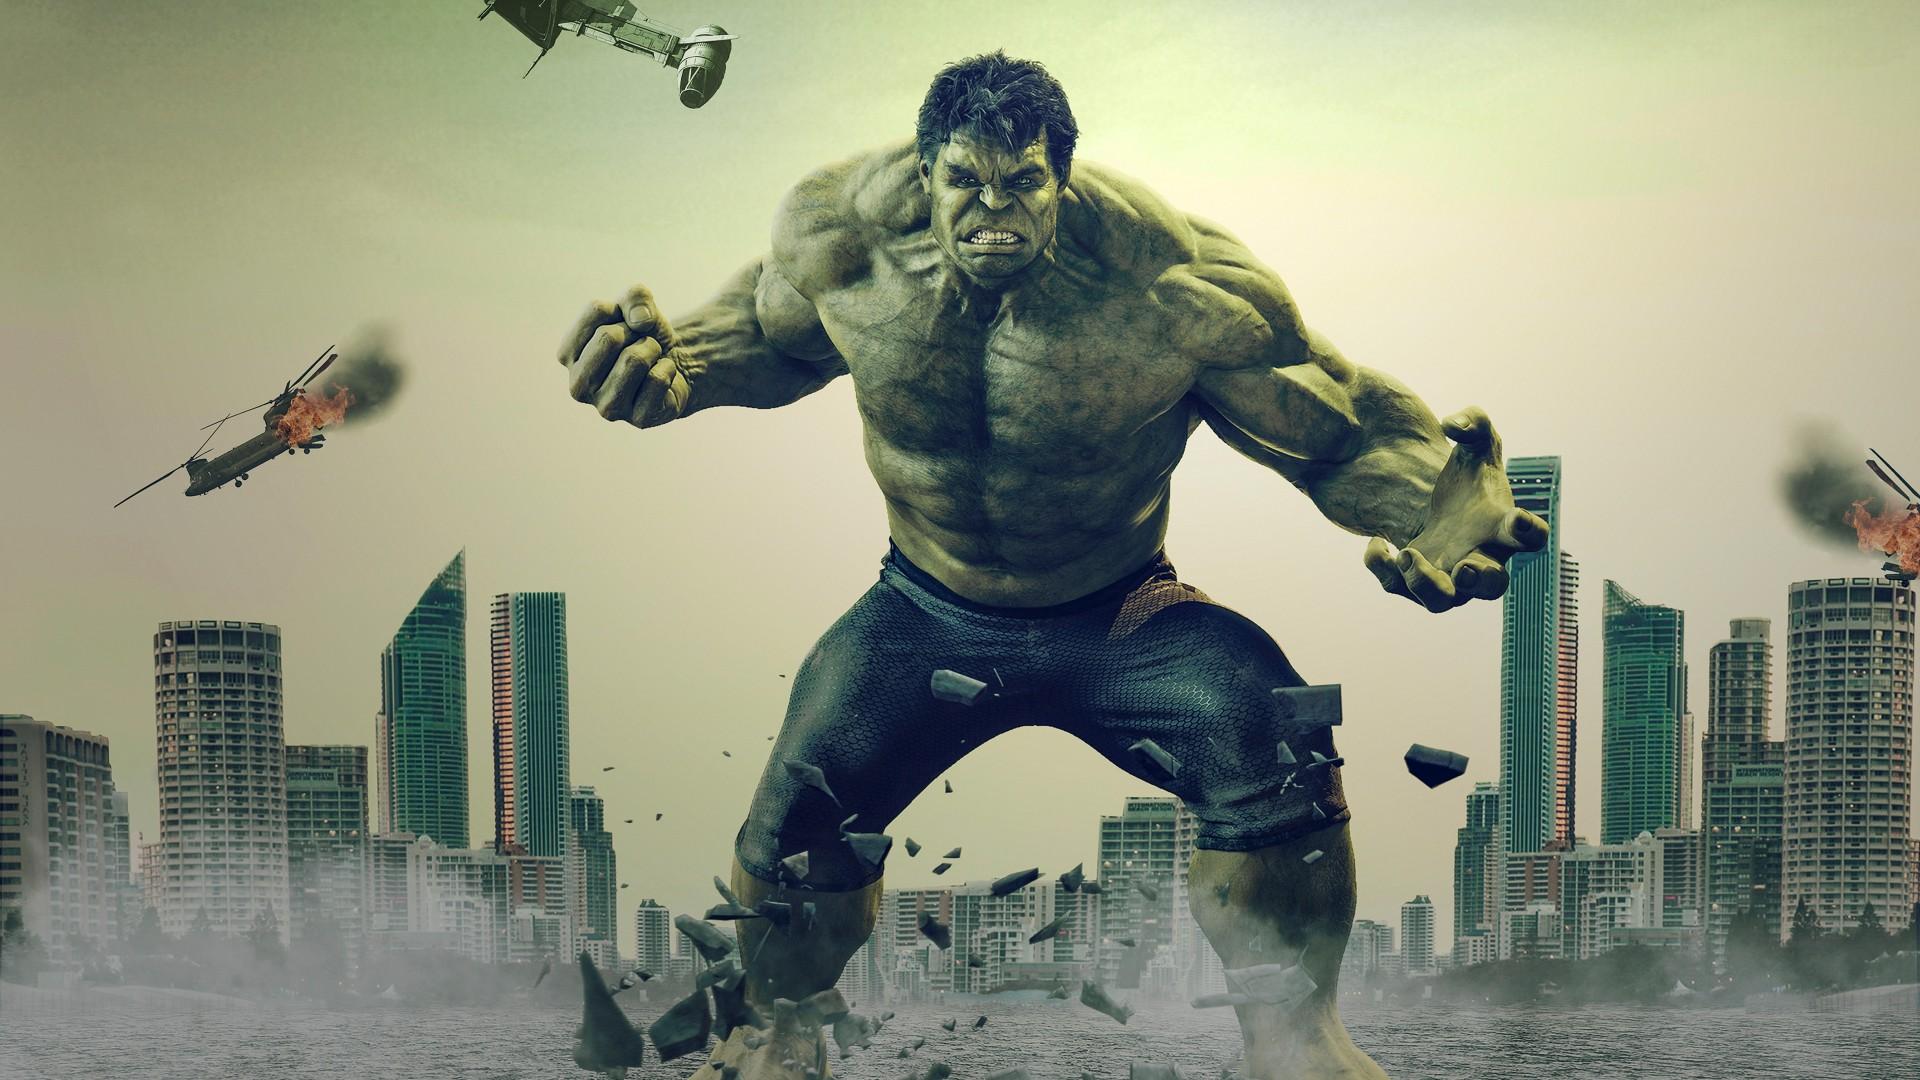 Cute Marvel Iphone Wallpaper Hulk 4k Wallpapers Hd Wallpapers Id 27128